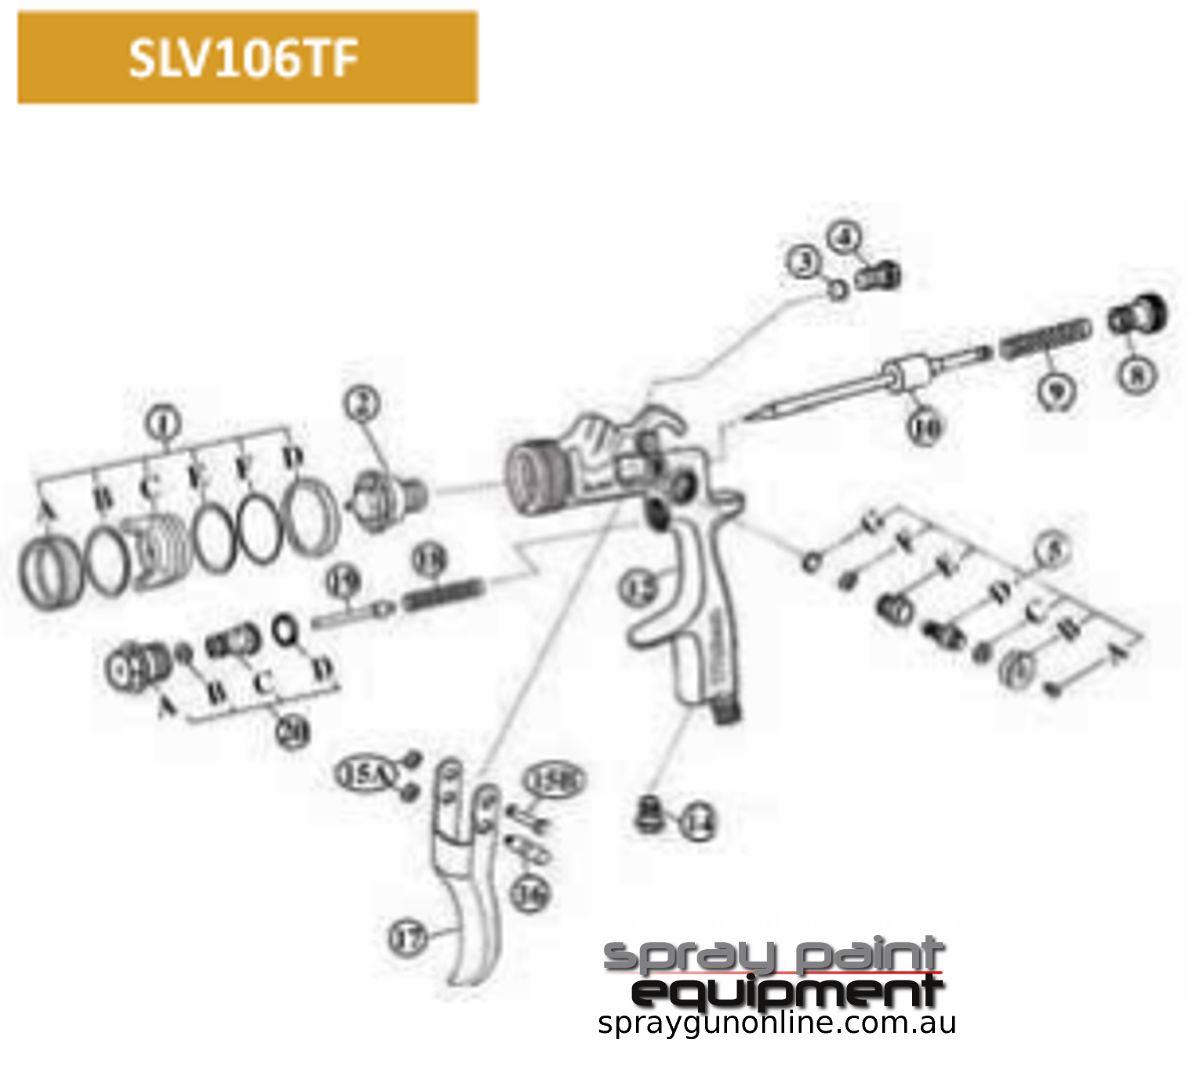 Spare parts schematic for Star SLV106TF Mini EVOT spray guns